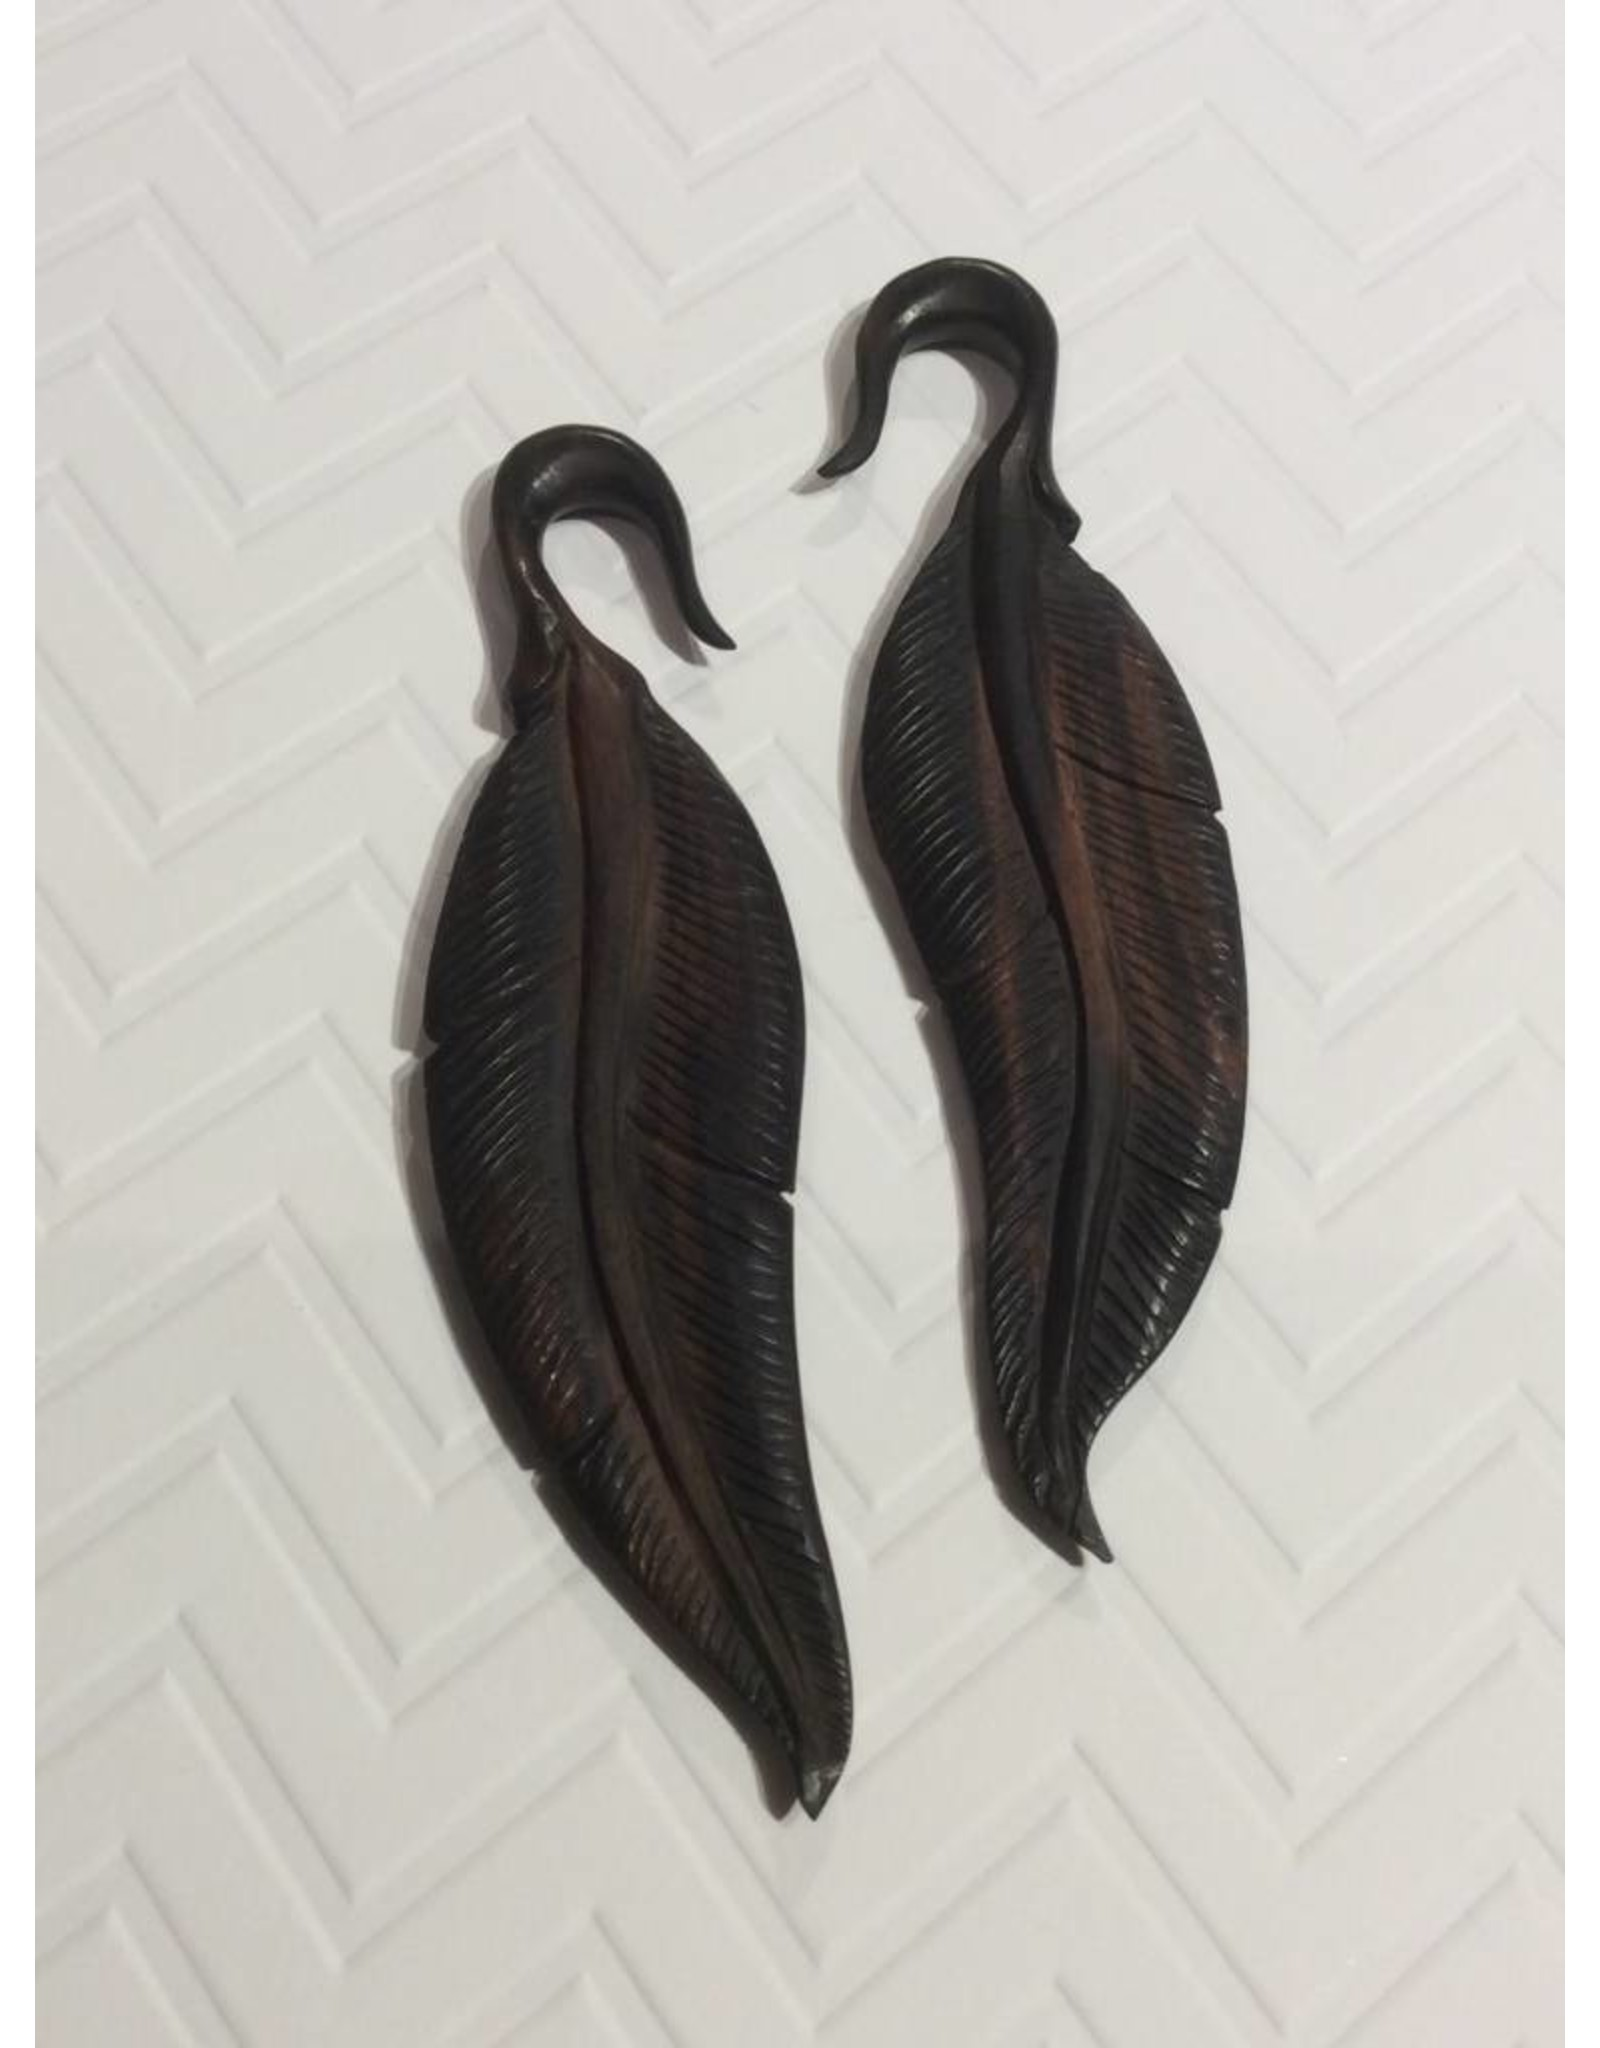 2g Ebony Feather Hangers